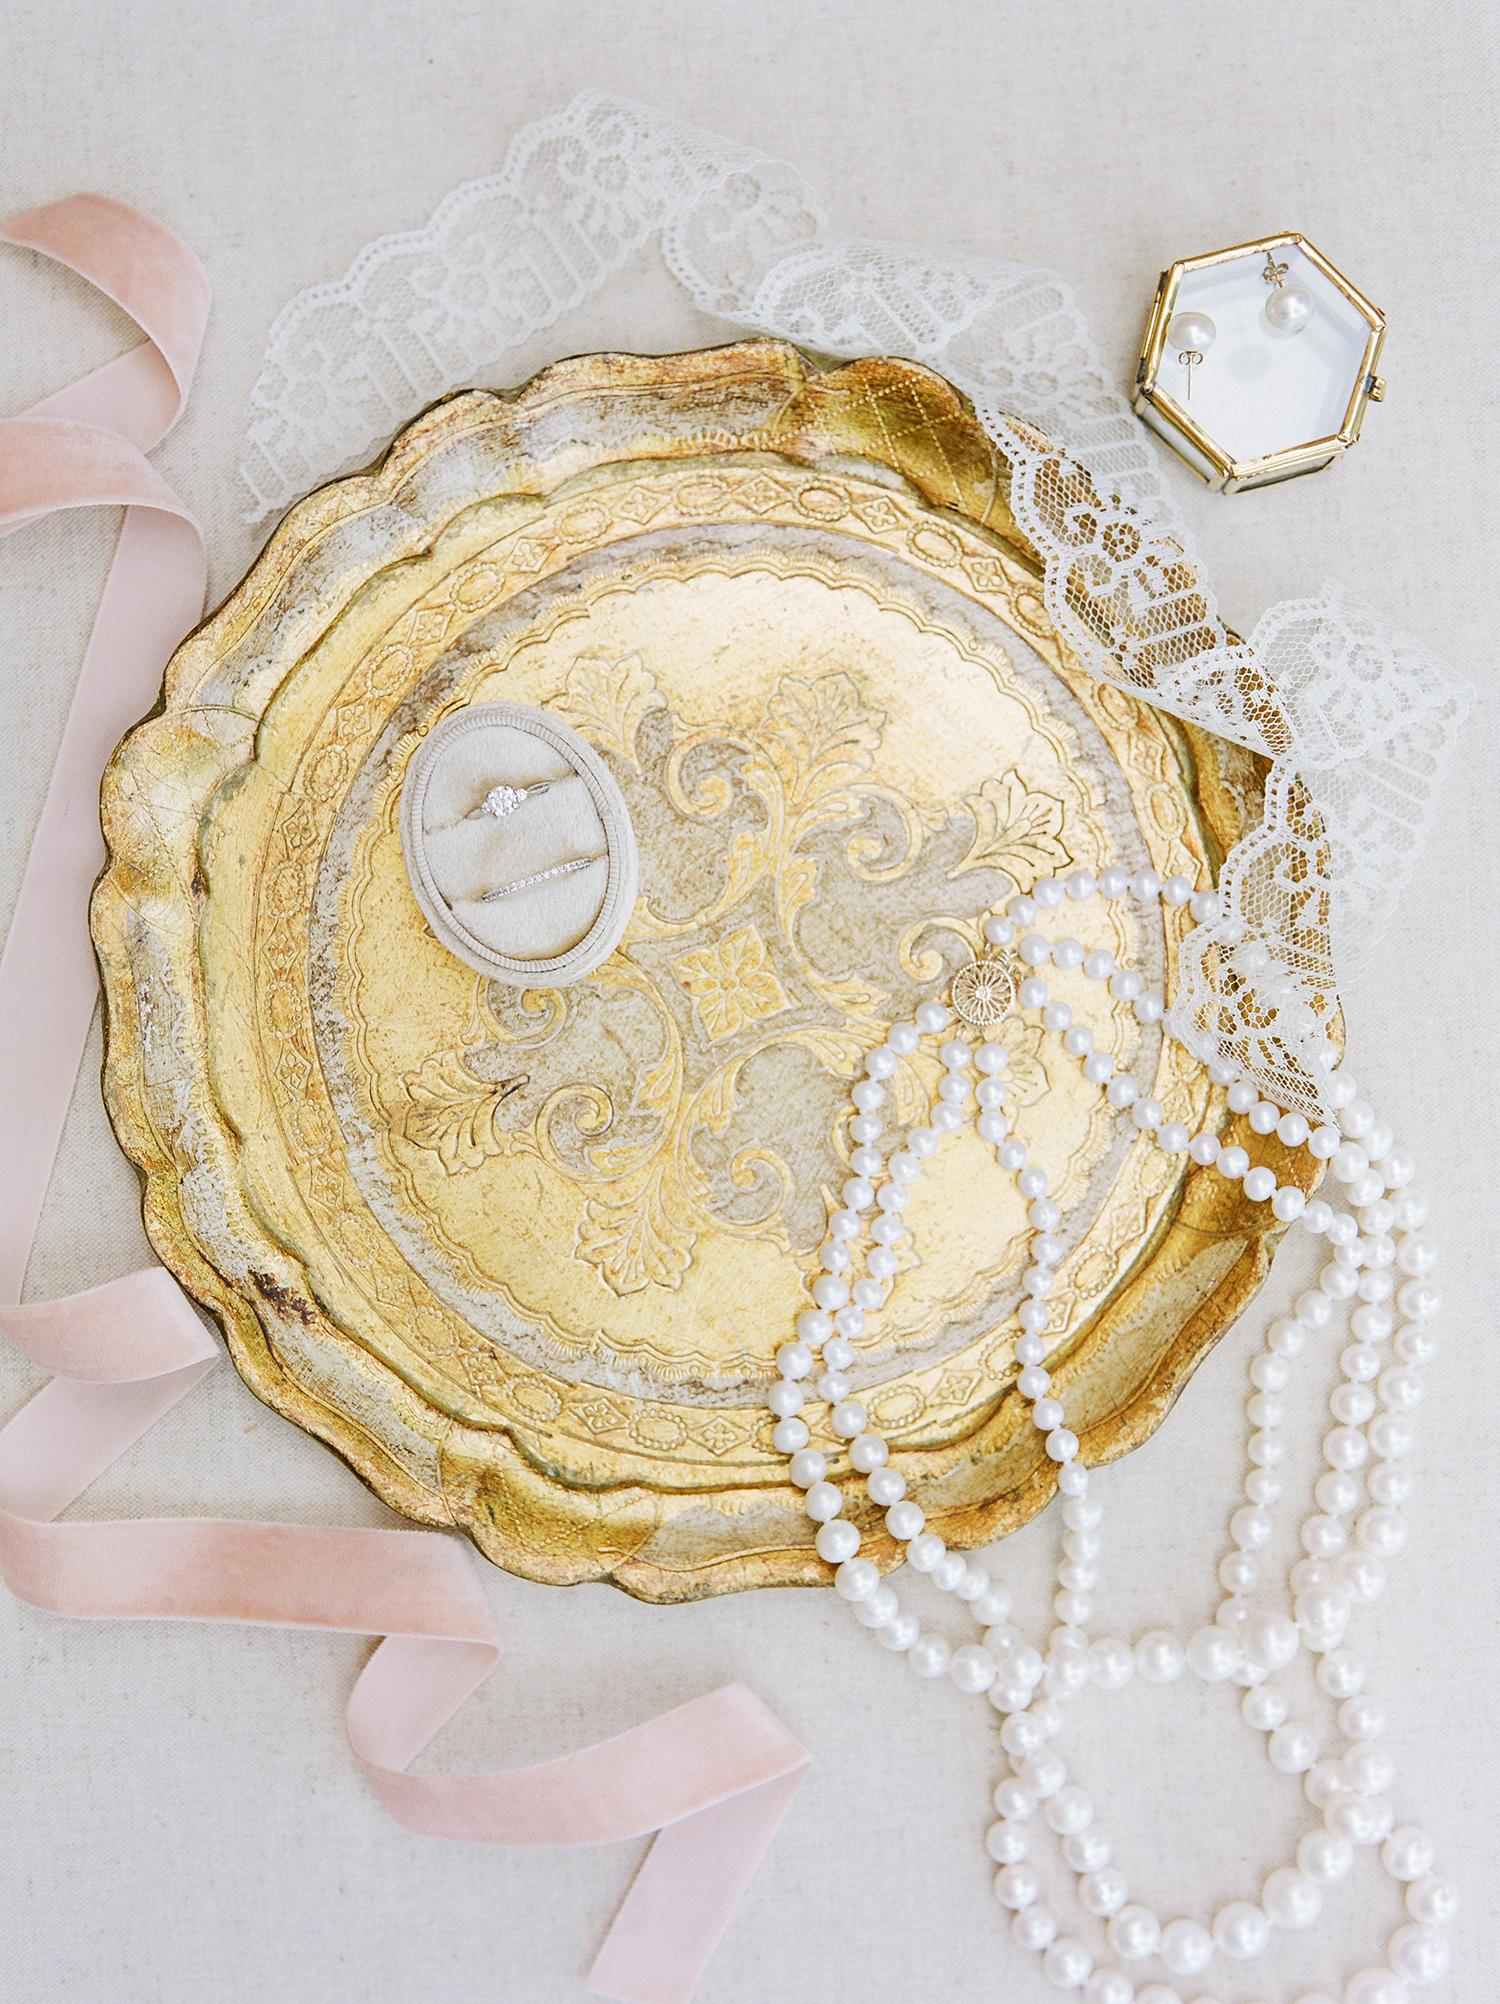 anwuli patrick wedding jewelry on gold plate